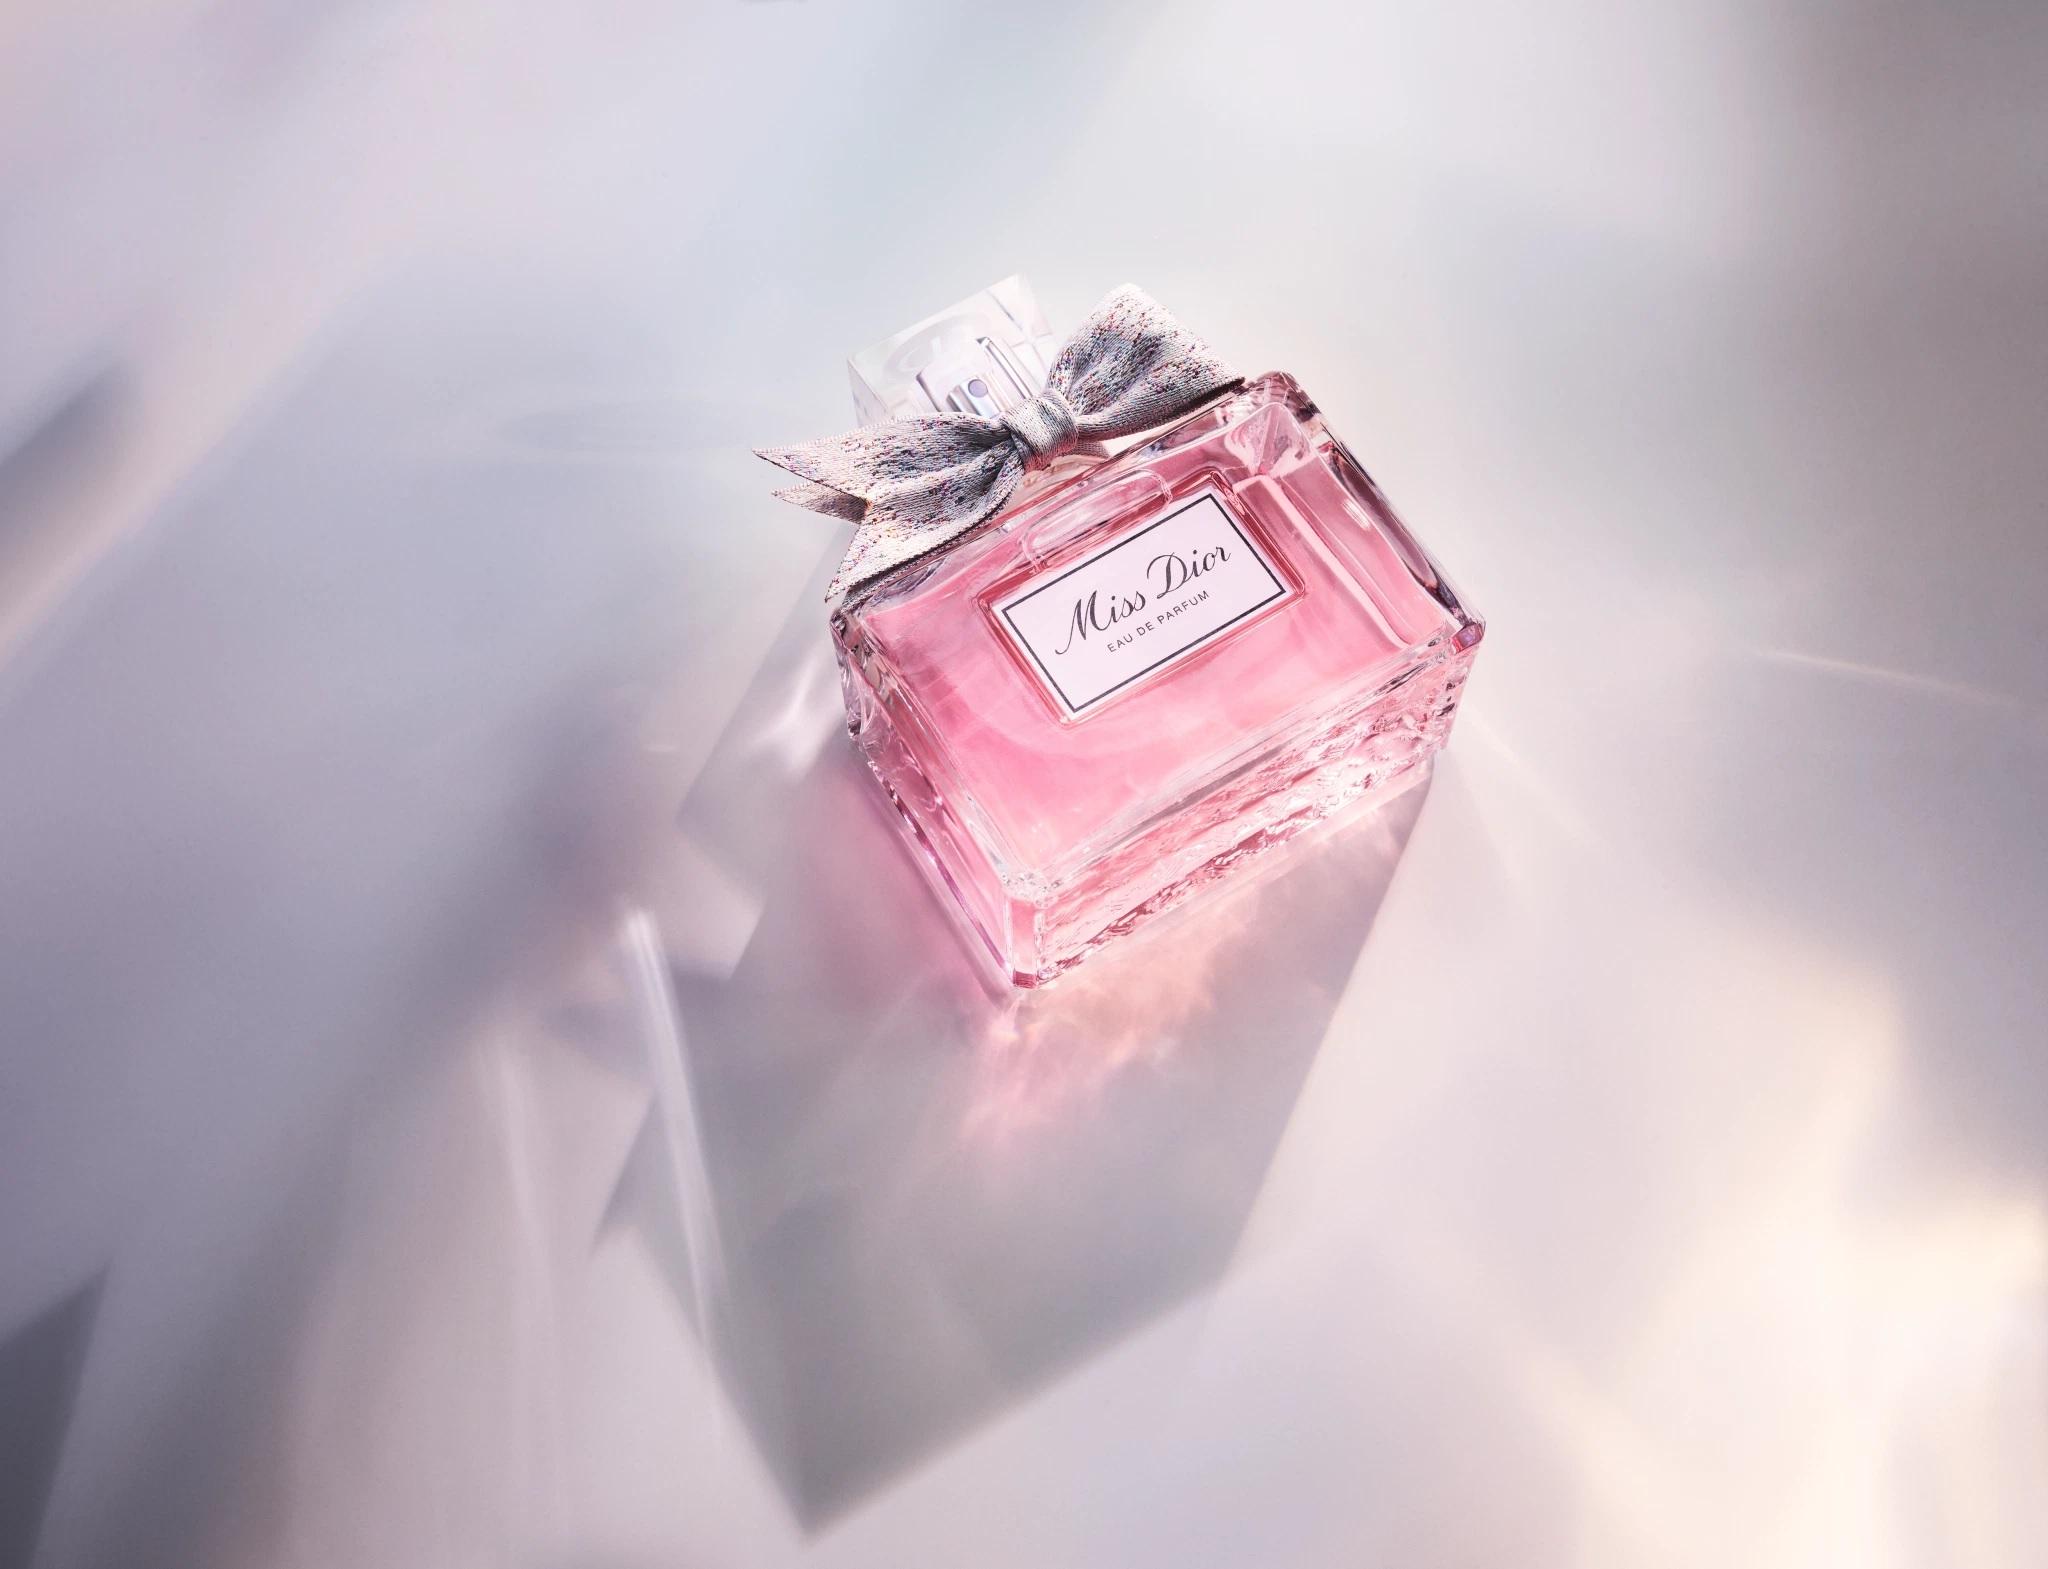 Mis Dior Eau De Parfum 2021 new